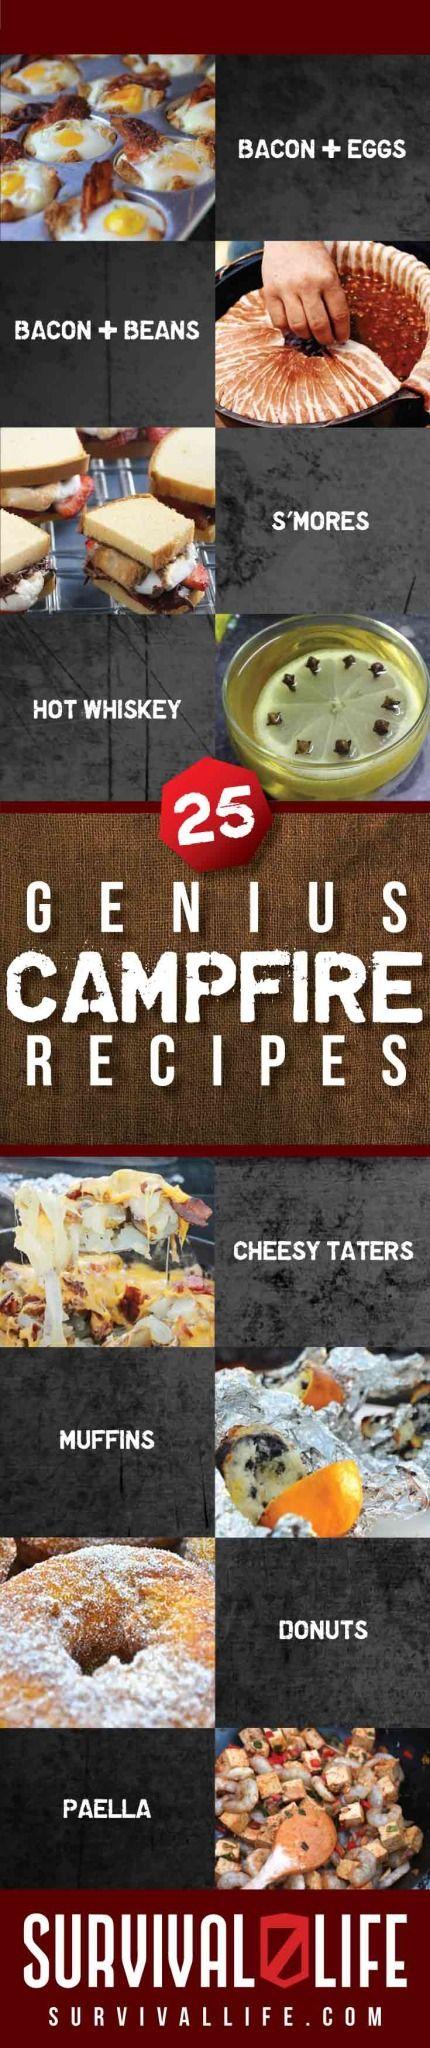 25 Genius Campfire Recipes | Survival Life | Preppers | Survival Gear and Emergency Preparedness